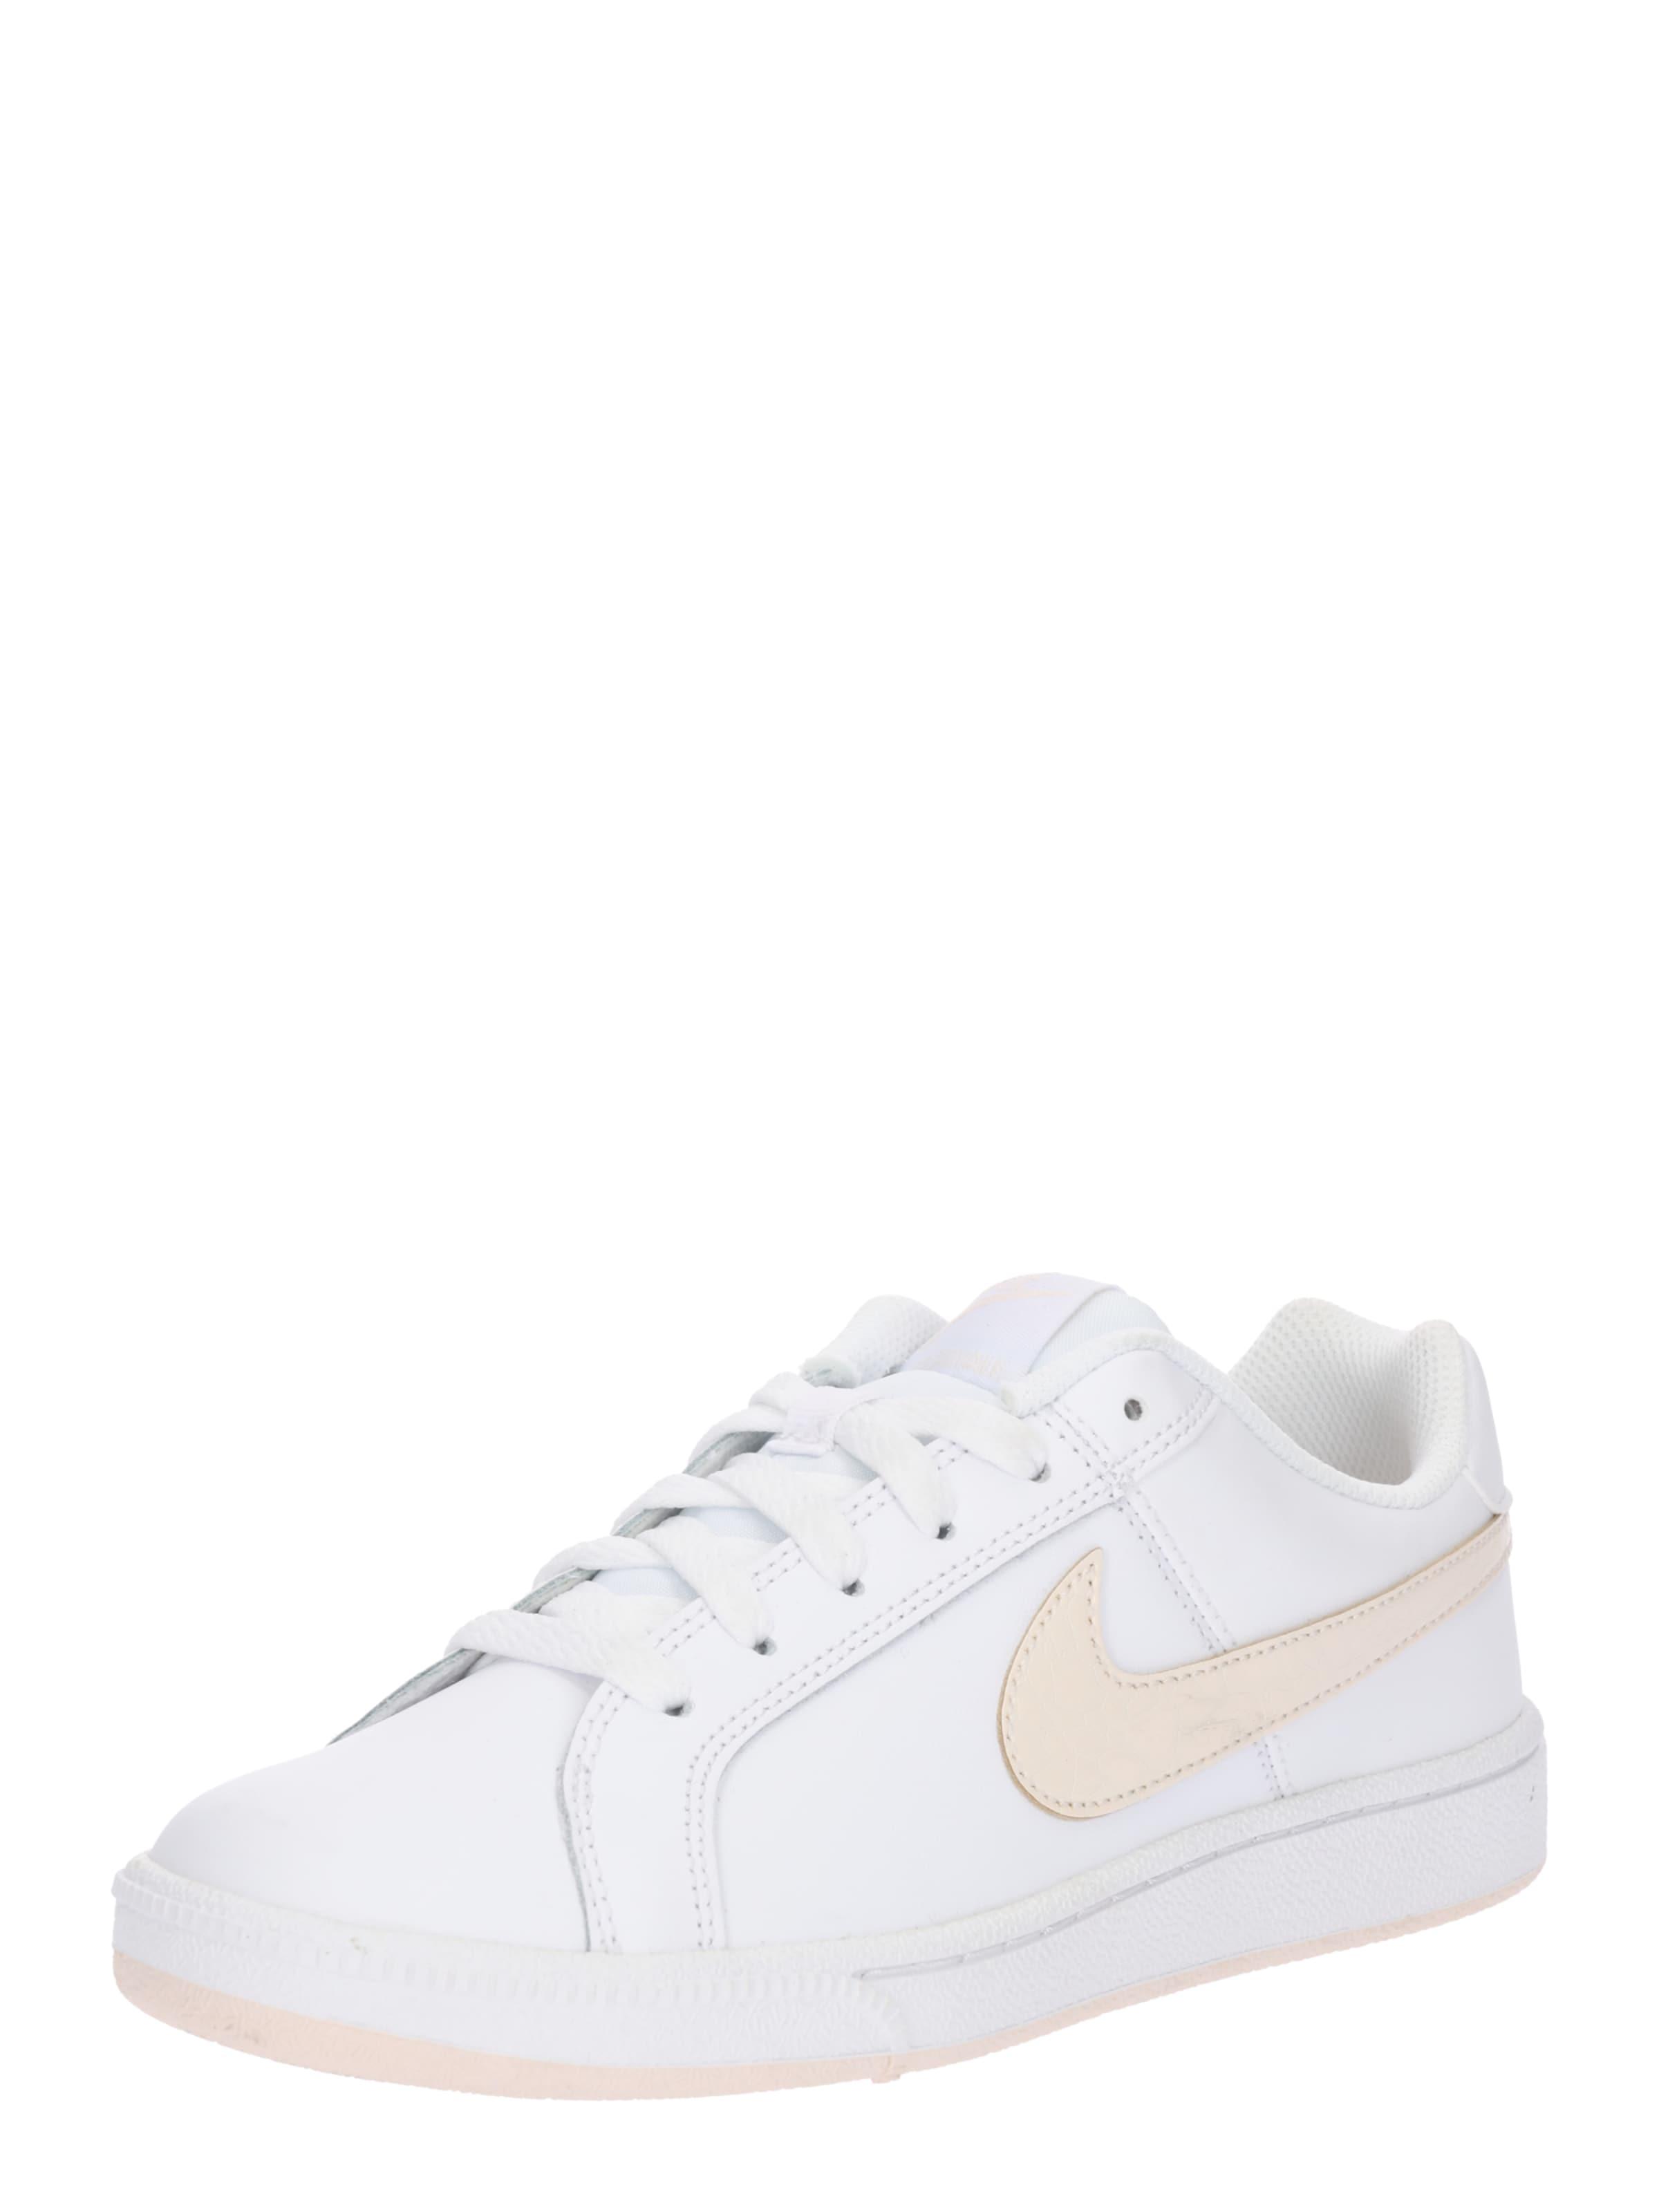 Nike Sportswear | Turnschuhe Court Court Turnschuhe Royale 7953c4